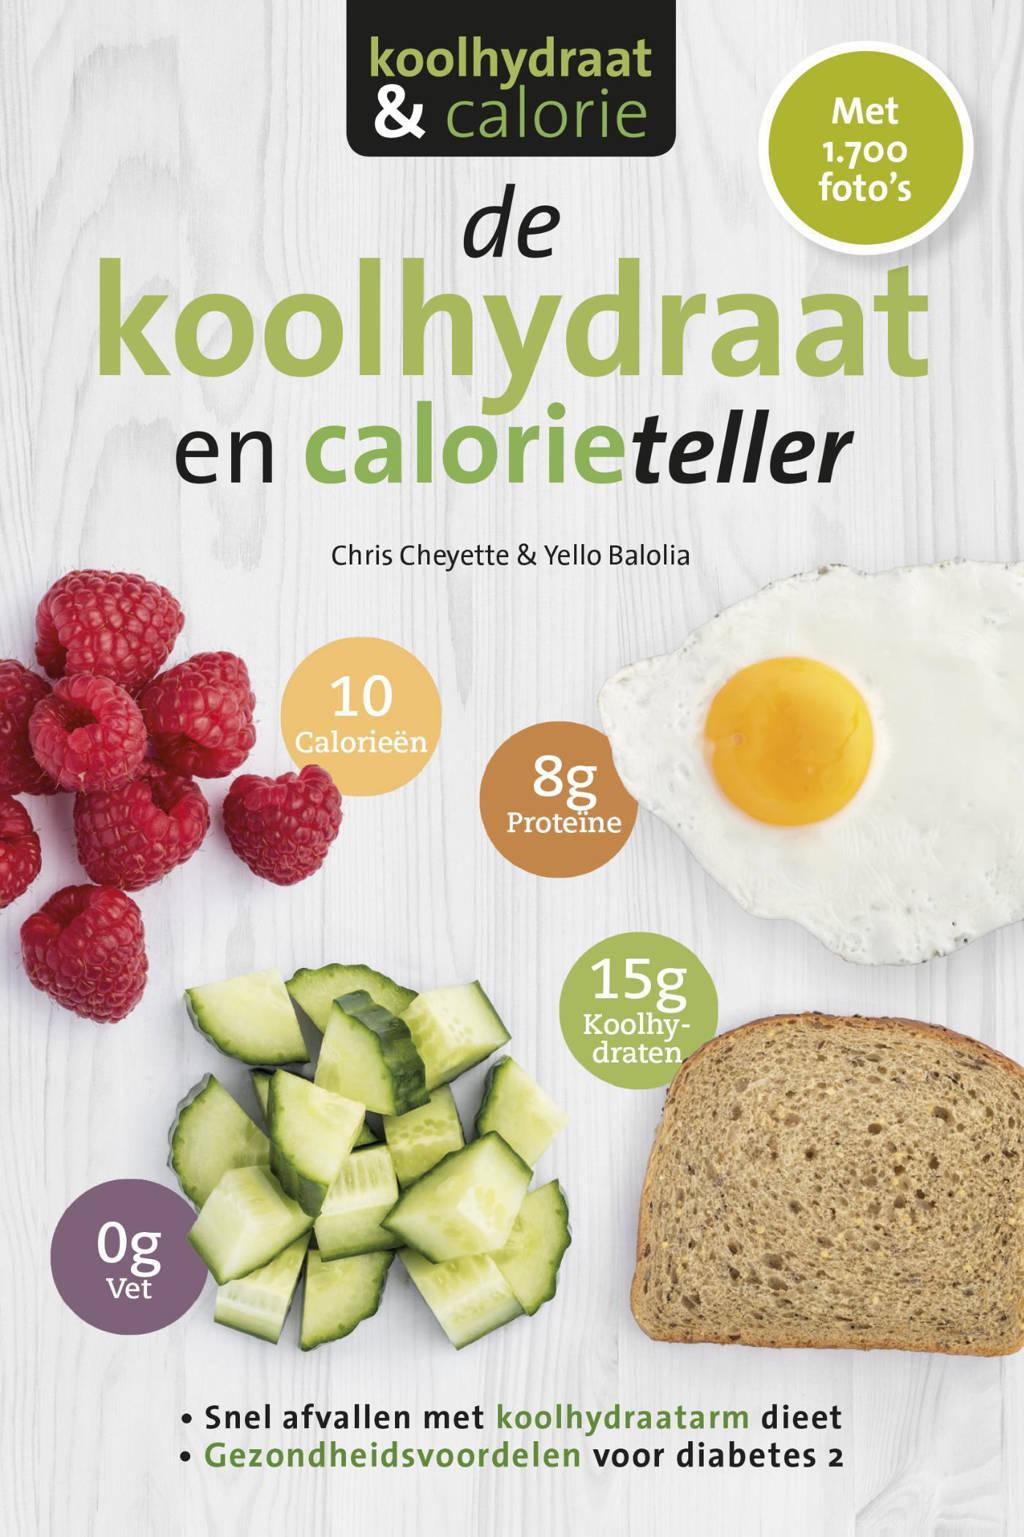 De koolhydraten- en calorieteller - Chris Cheyette en Yello Balolia